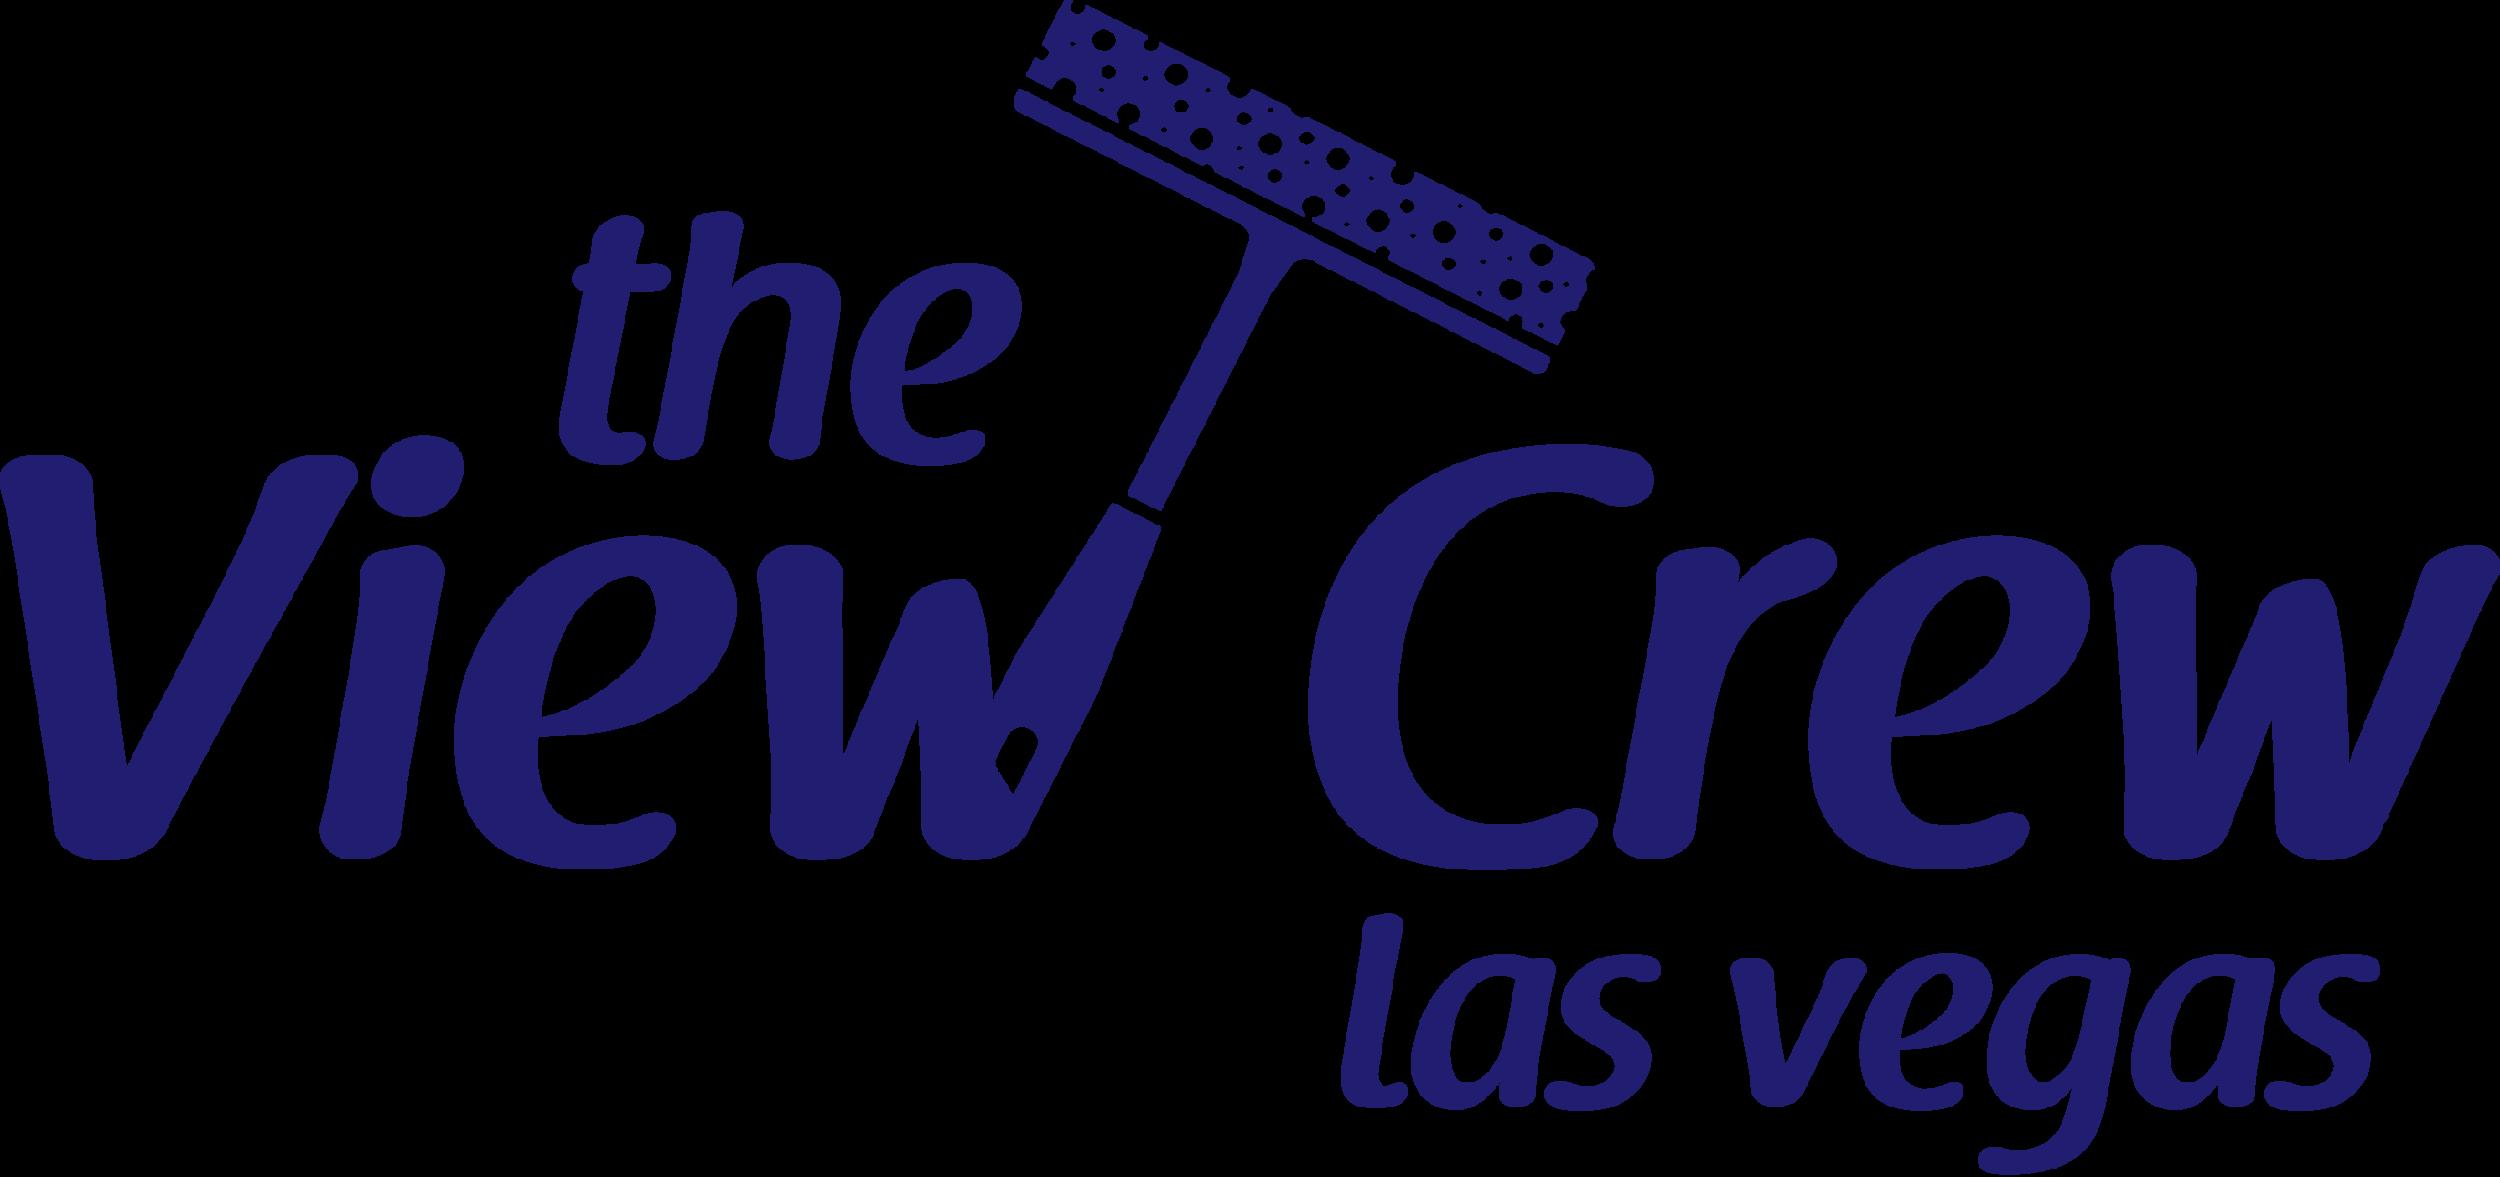 ViewCrewLV_LogoFINALBlue.png